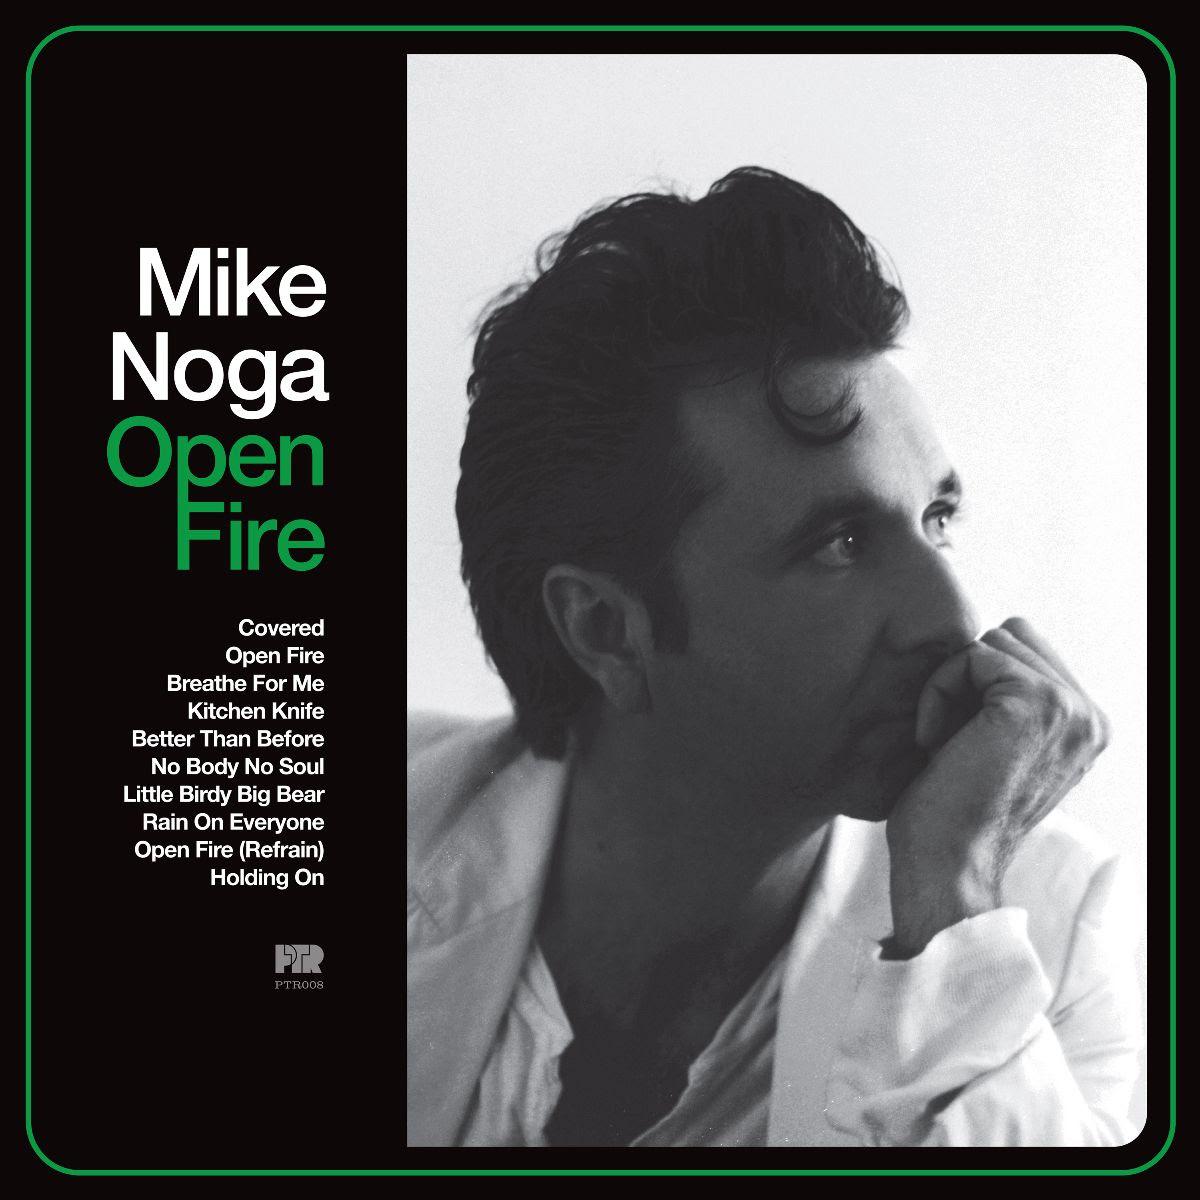 Mike Noga album Open Fire